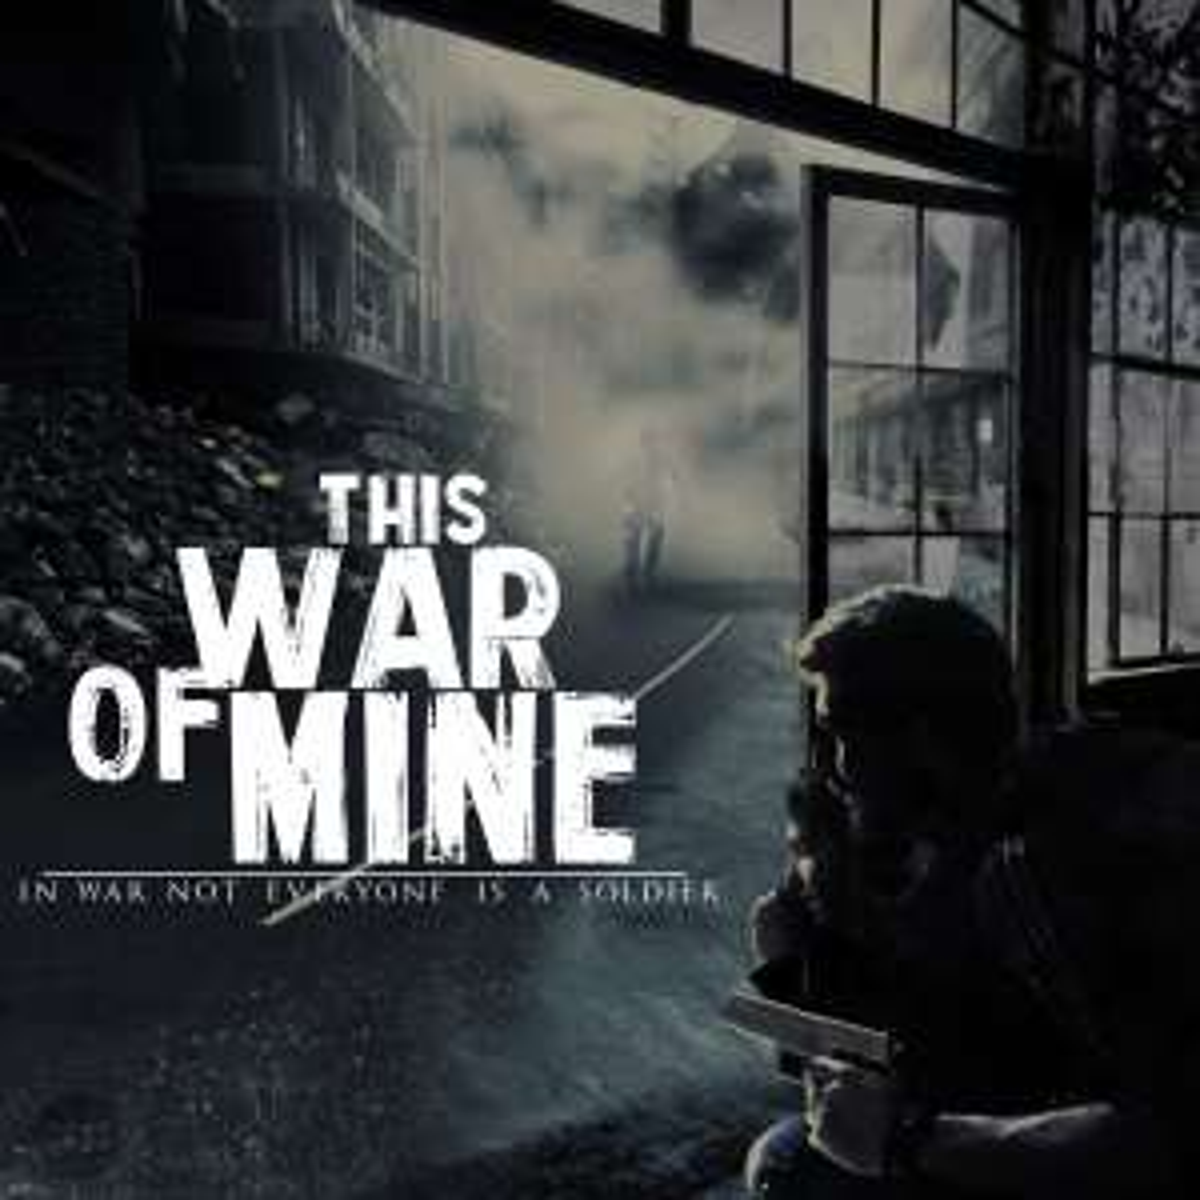 This War of Mine - IOS, App Store, iTunes: £1.99